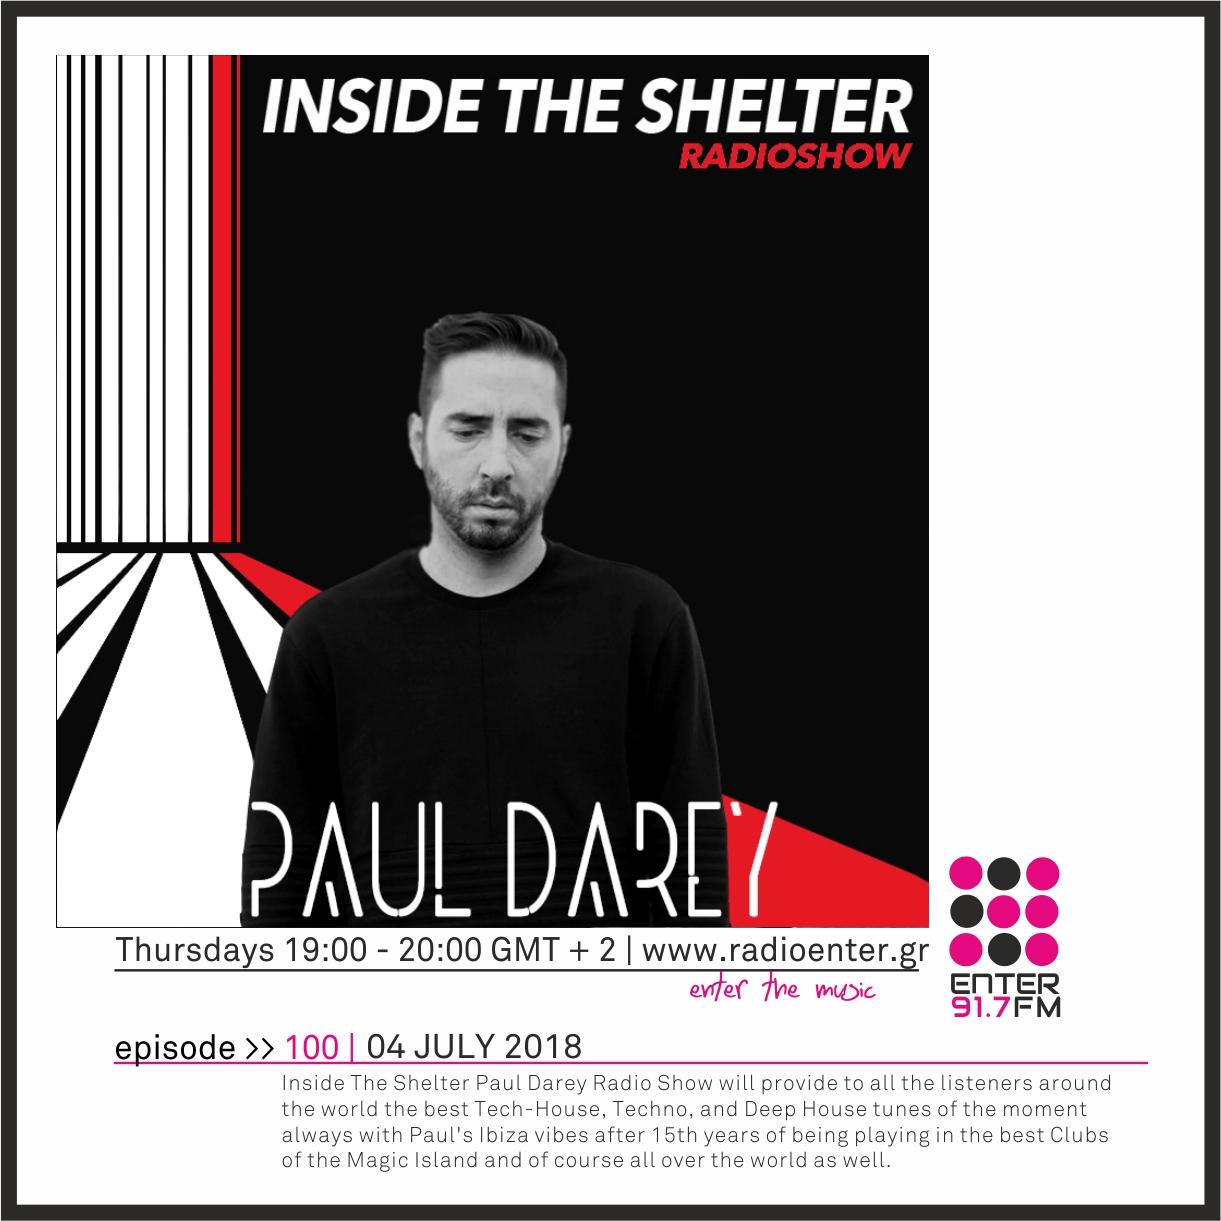 2018.07.30 - Paul Darey 'Inside The Shelter' 100